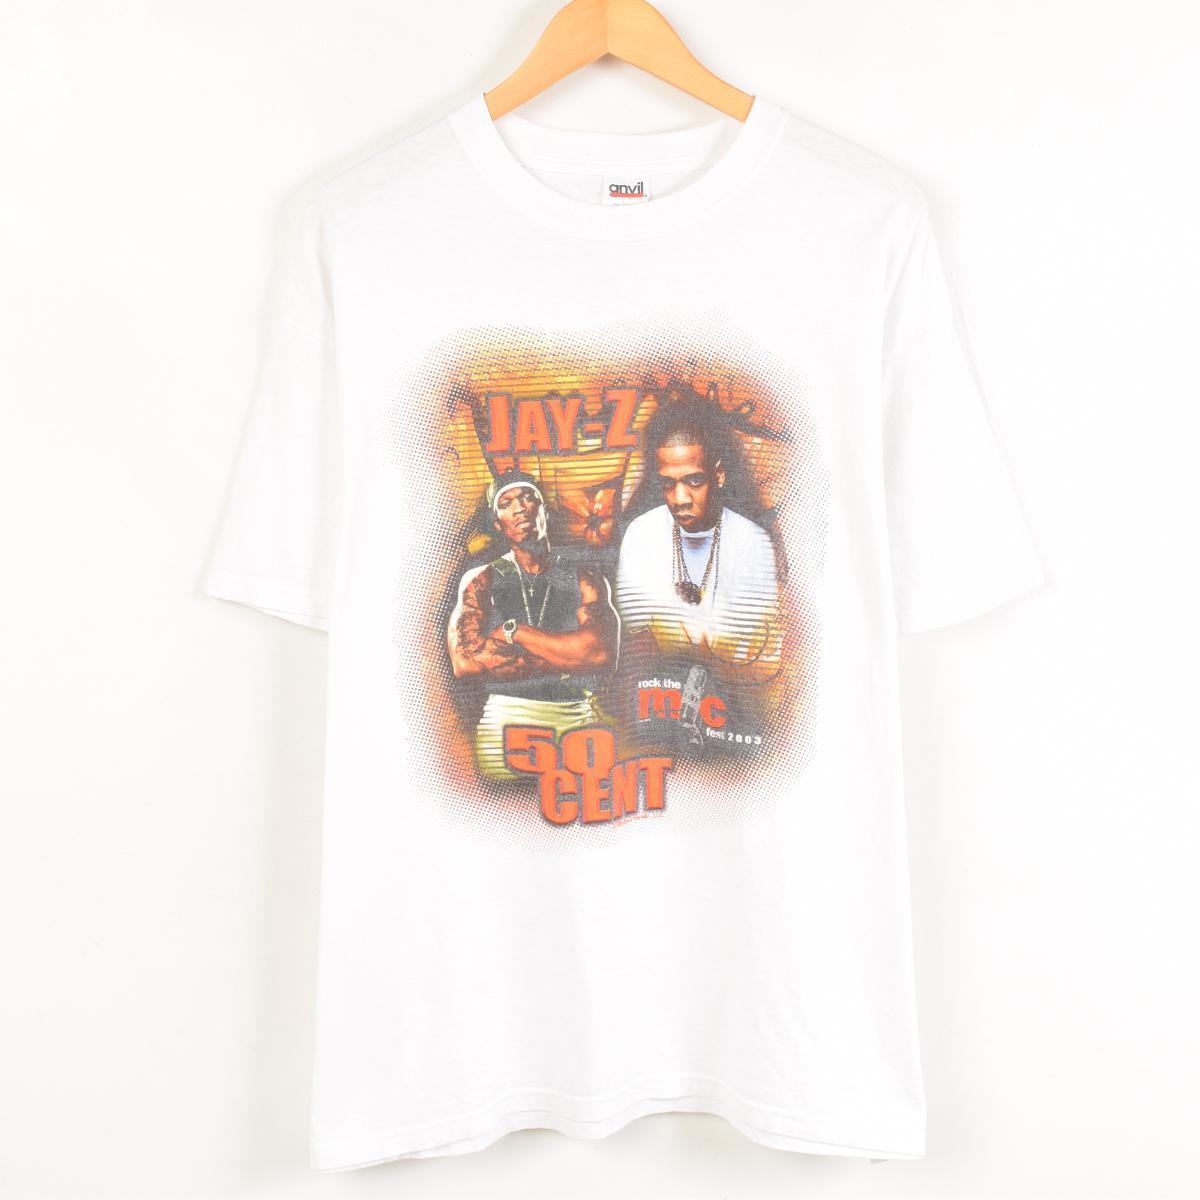 rock the mc fest 2003 JAY-Z AND 50CENT バンドTシャツ メンズXL anvil /wab9986 【中古】 【170520】